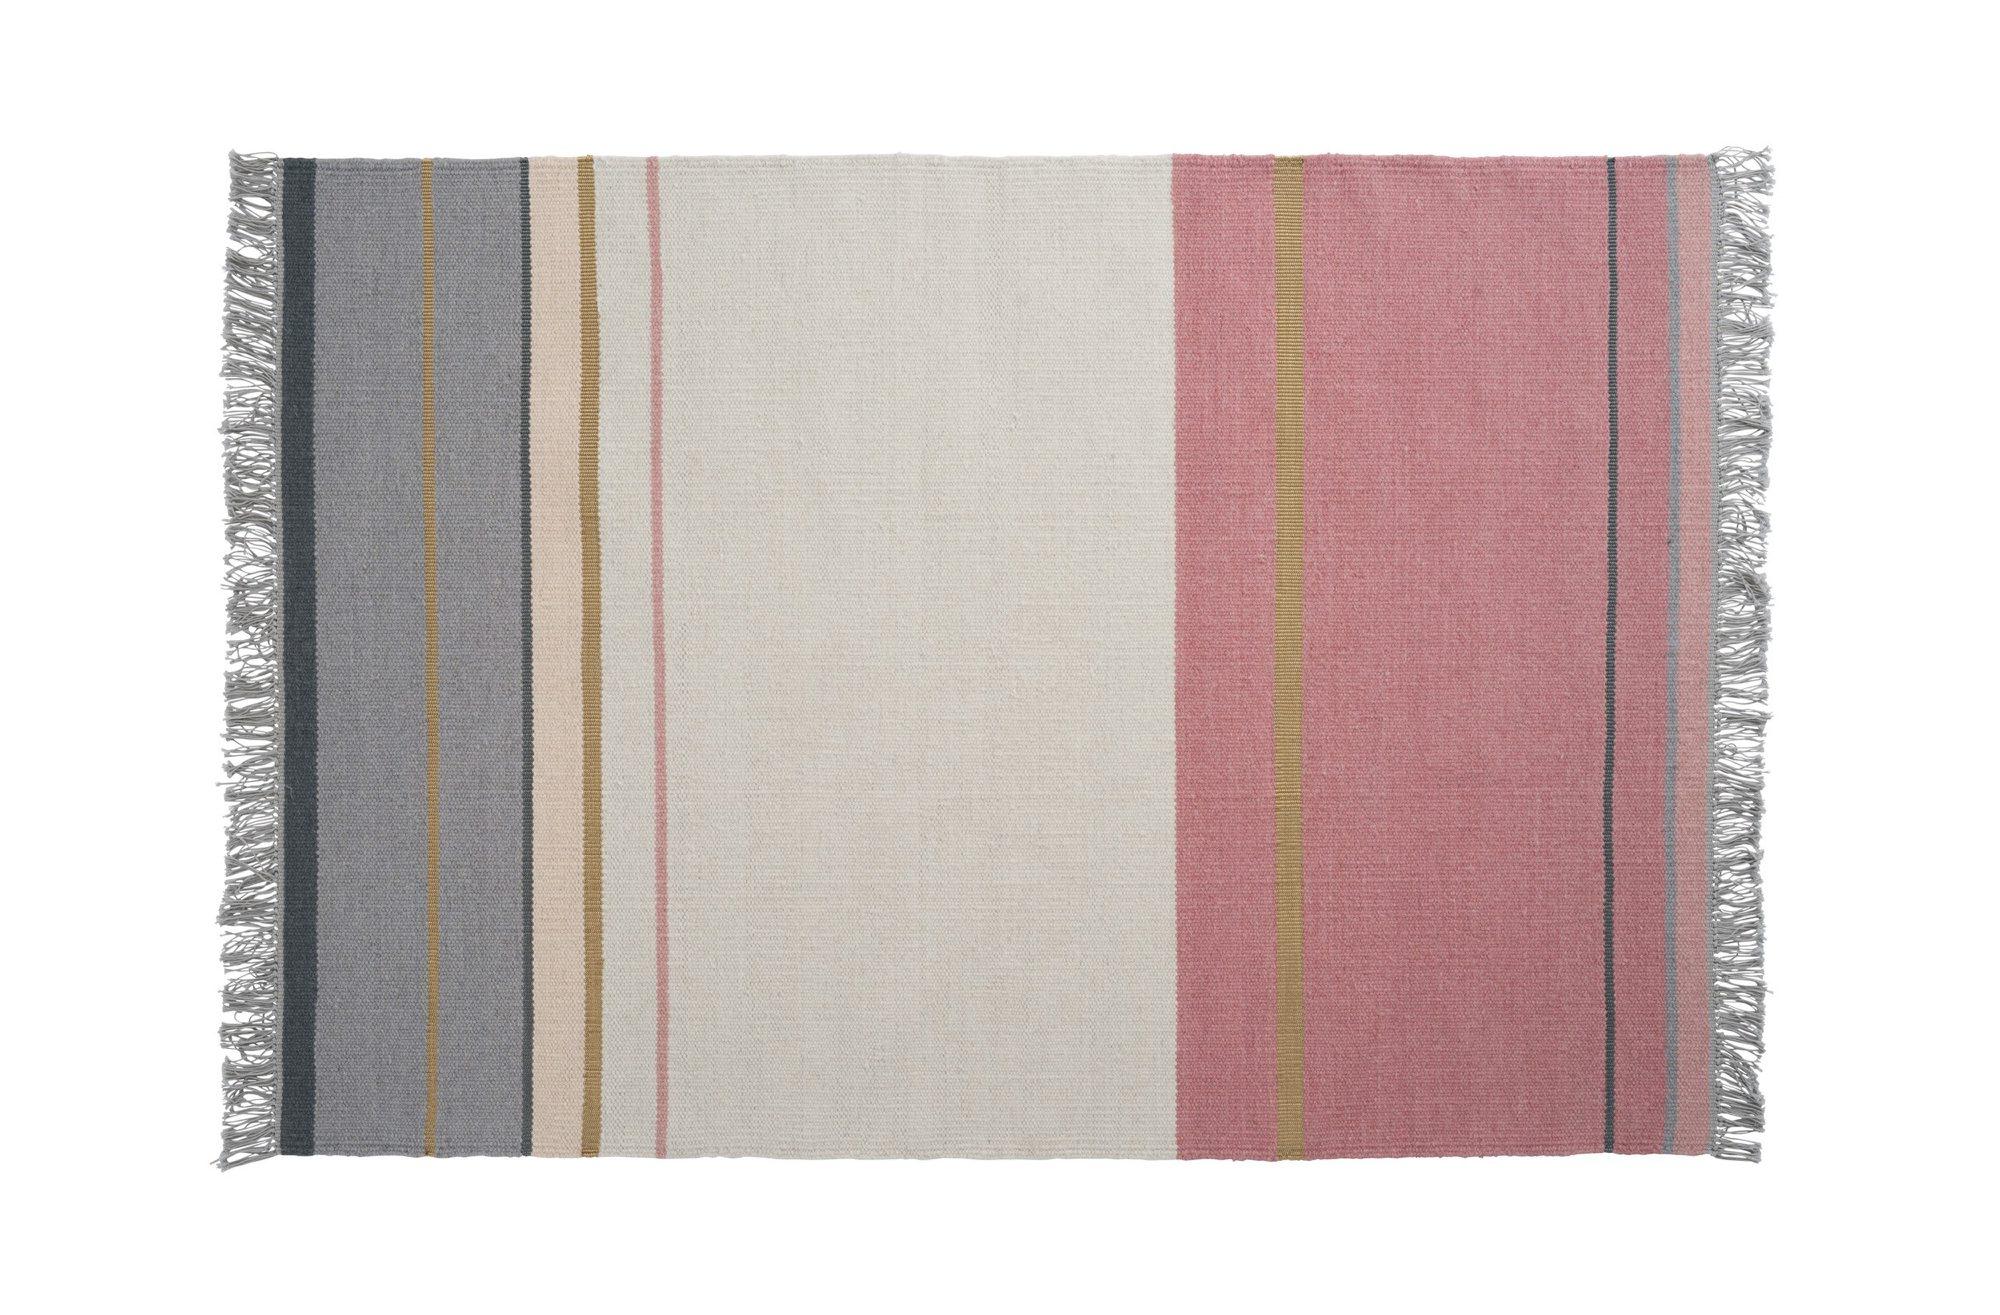 Dette nydelige teppet vil passe godt hvor som helst. 80 x 150 cm. Kr 875, verket interiør.